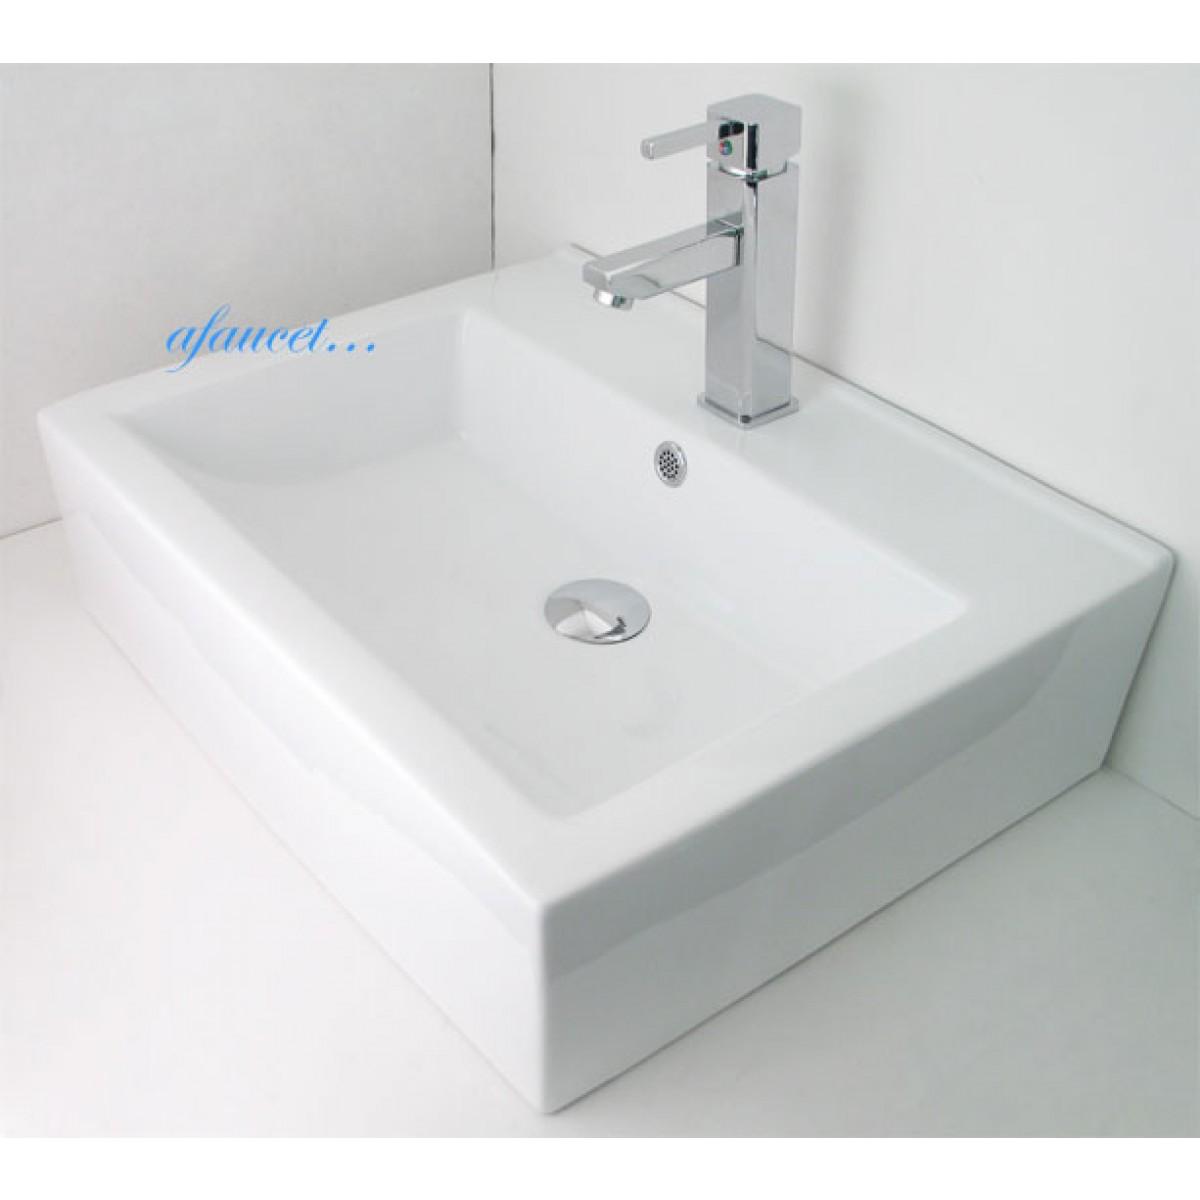 Rectangular Porcelain Ceramic Single Hole Countertop